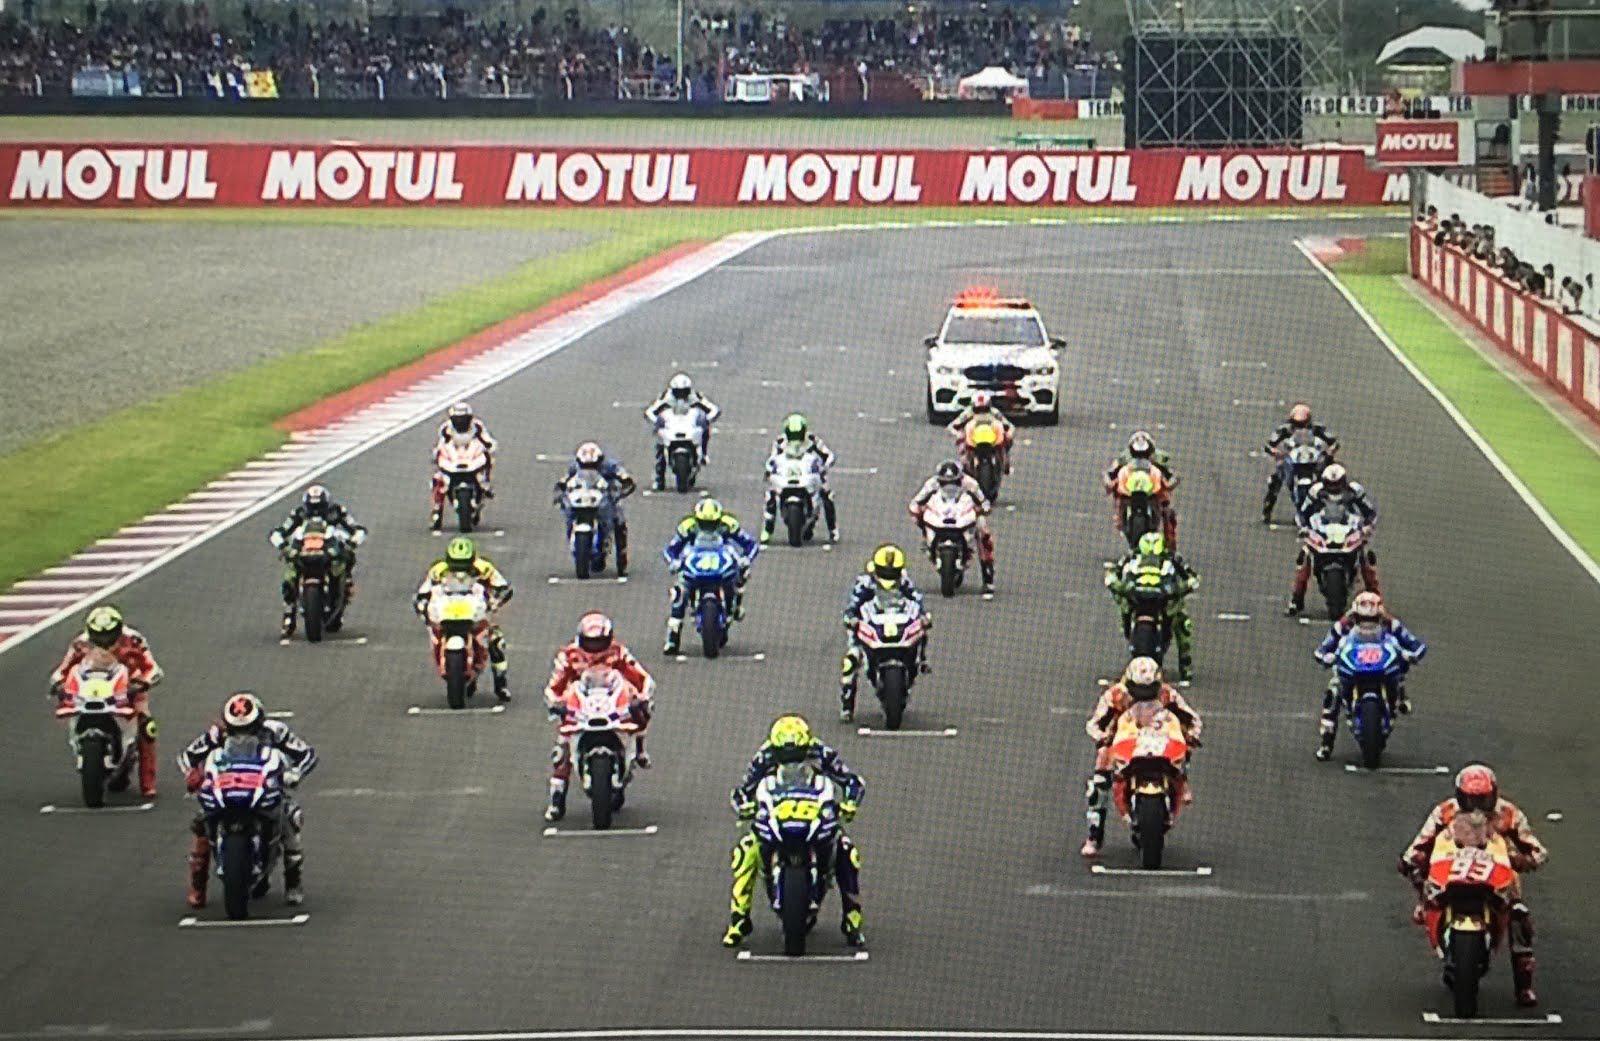 Moto Gp Start